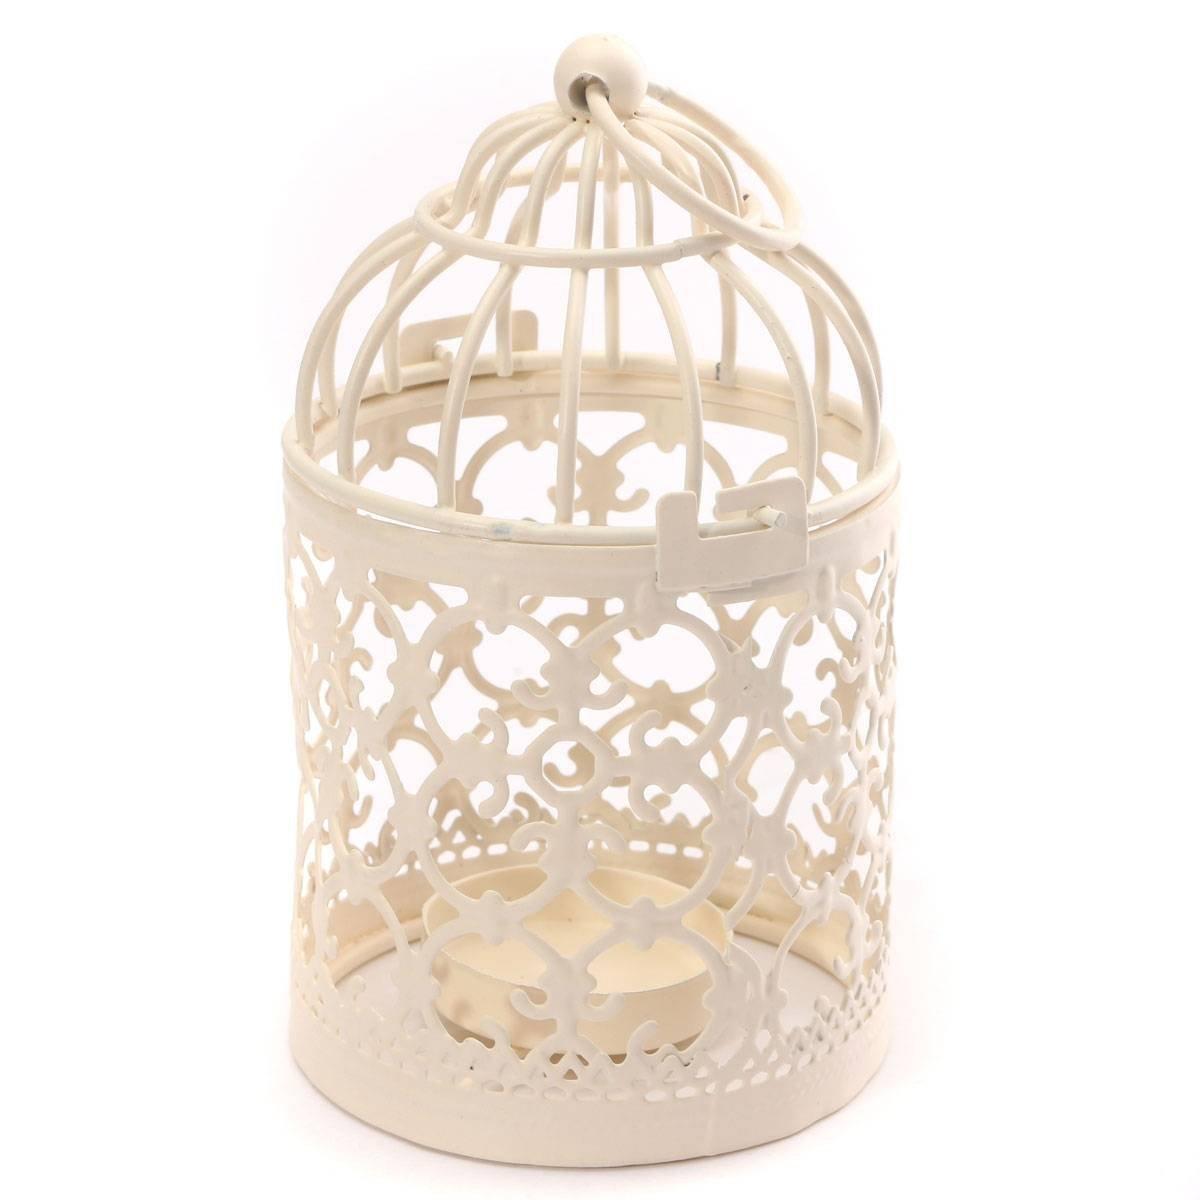 Freedi Metal Candle Holder Centerpiece Decorative Hollow out Birdcage Iron LED Hanging Candlestick Lantern